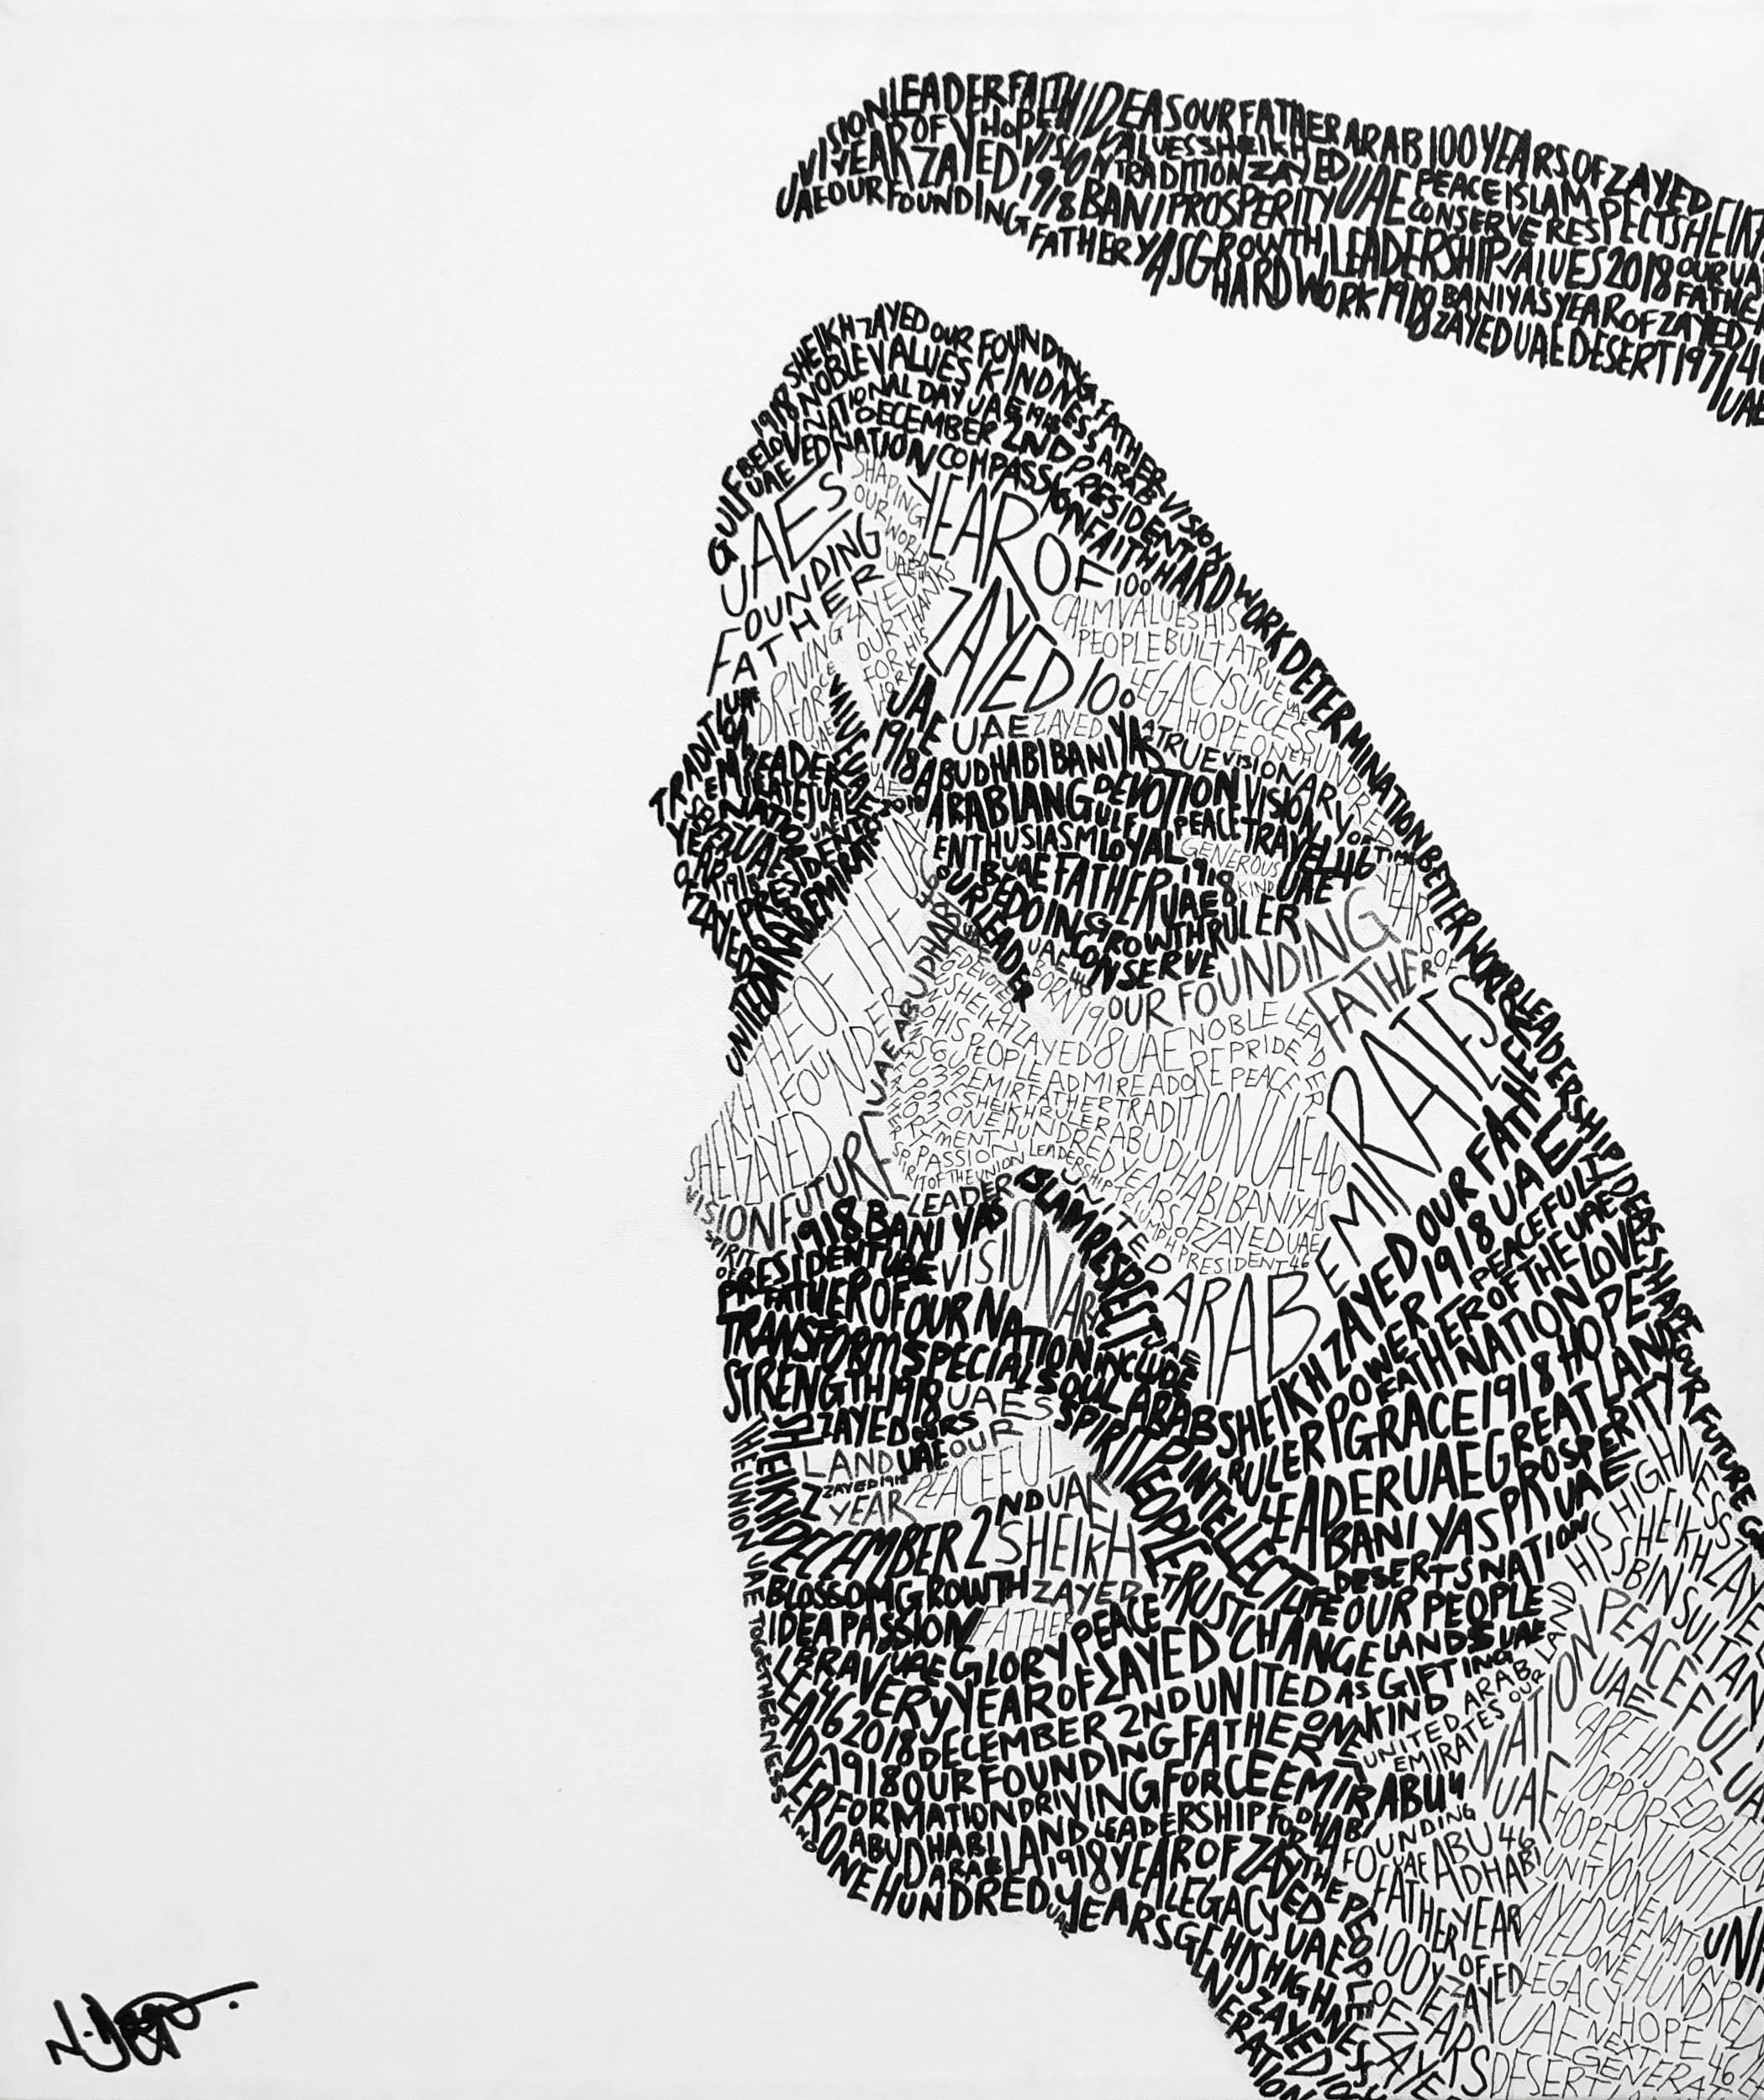 Story Of A Leader 2 Natalie Daghestani Art Dubai Artist BSAB